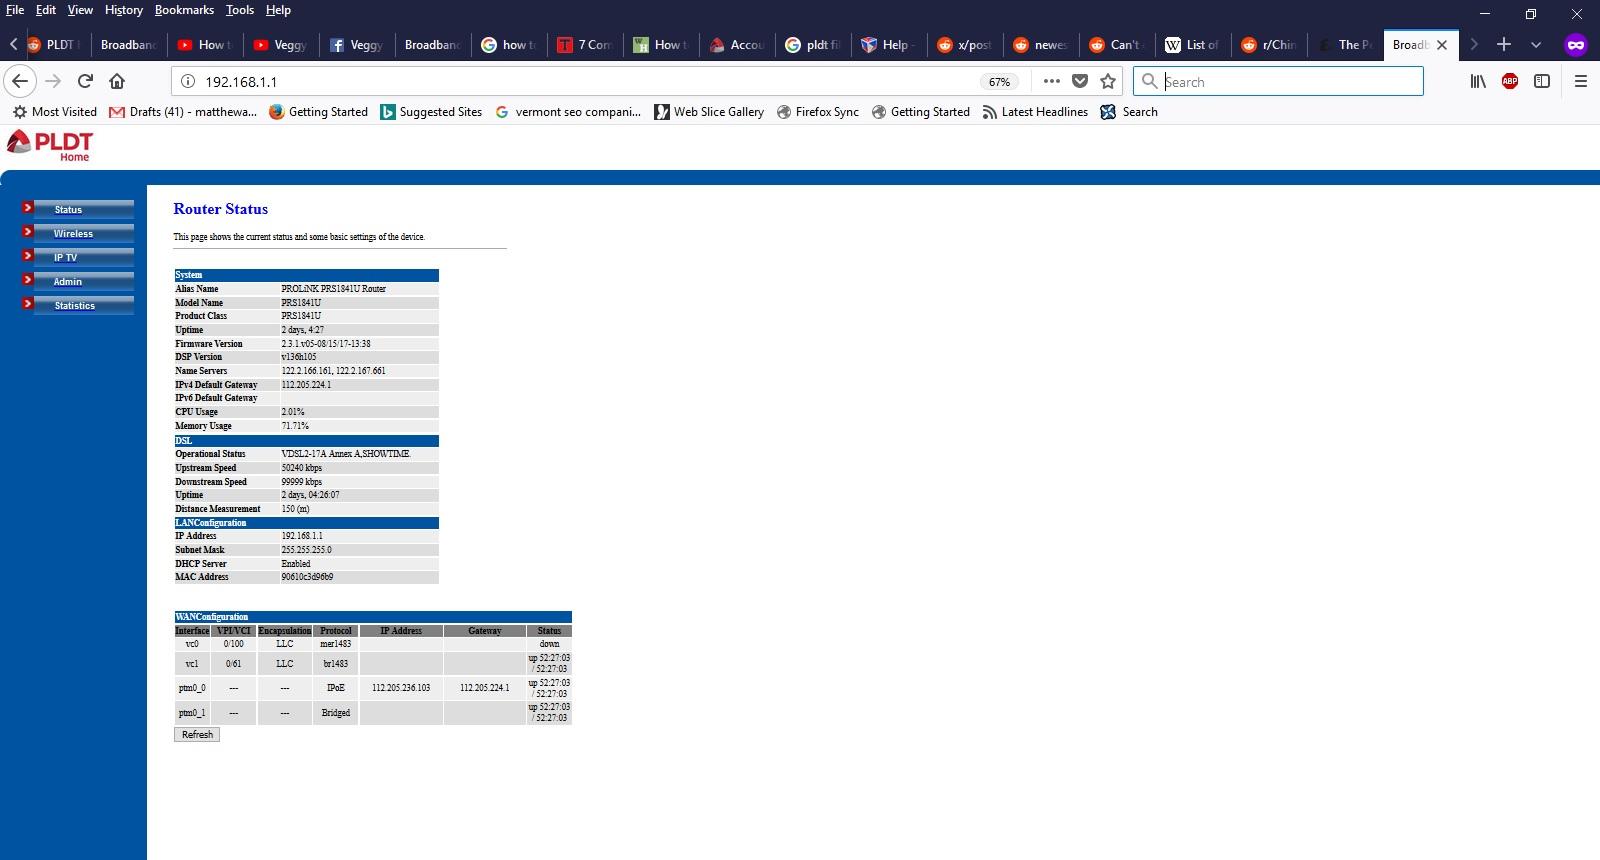 PLDT dashboard — imgbb com